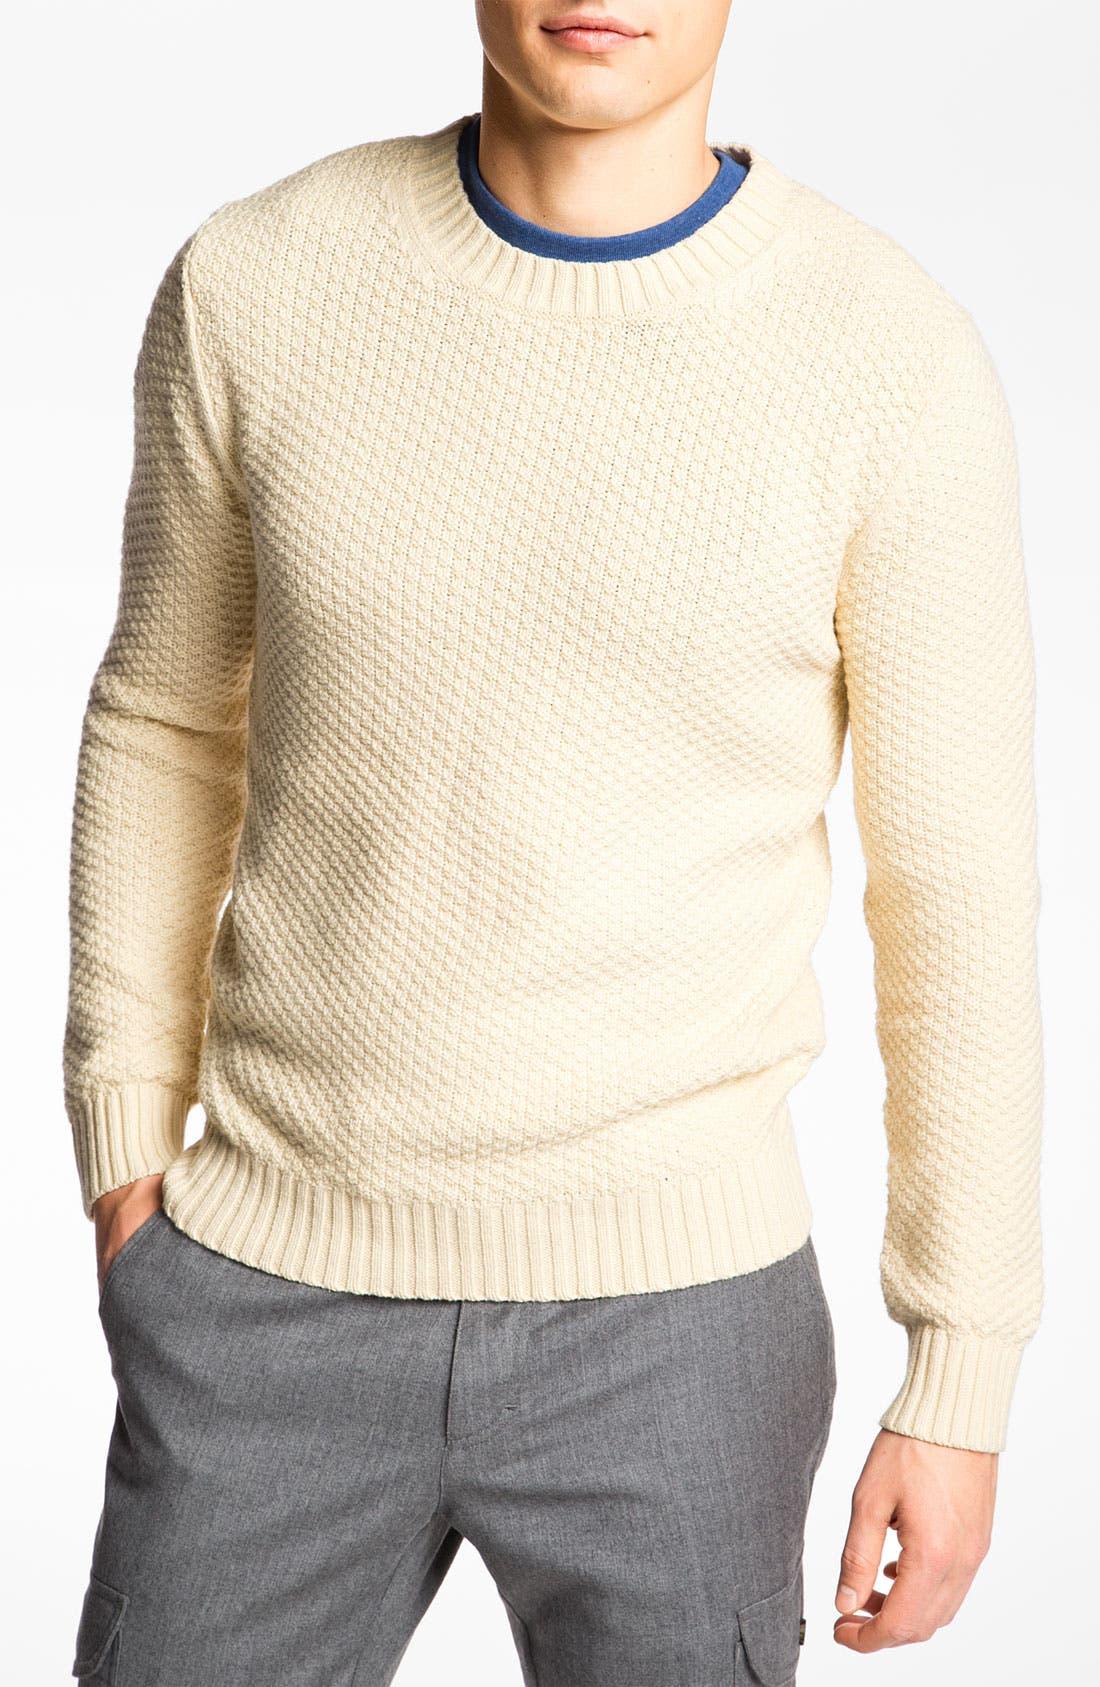 Alternate Image 1 Selected - Gant Rugger 'Pineapple Knit' Sweater